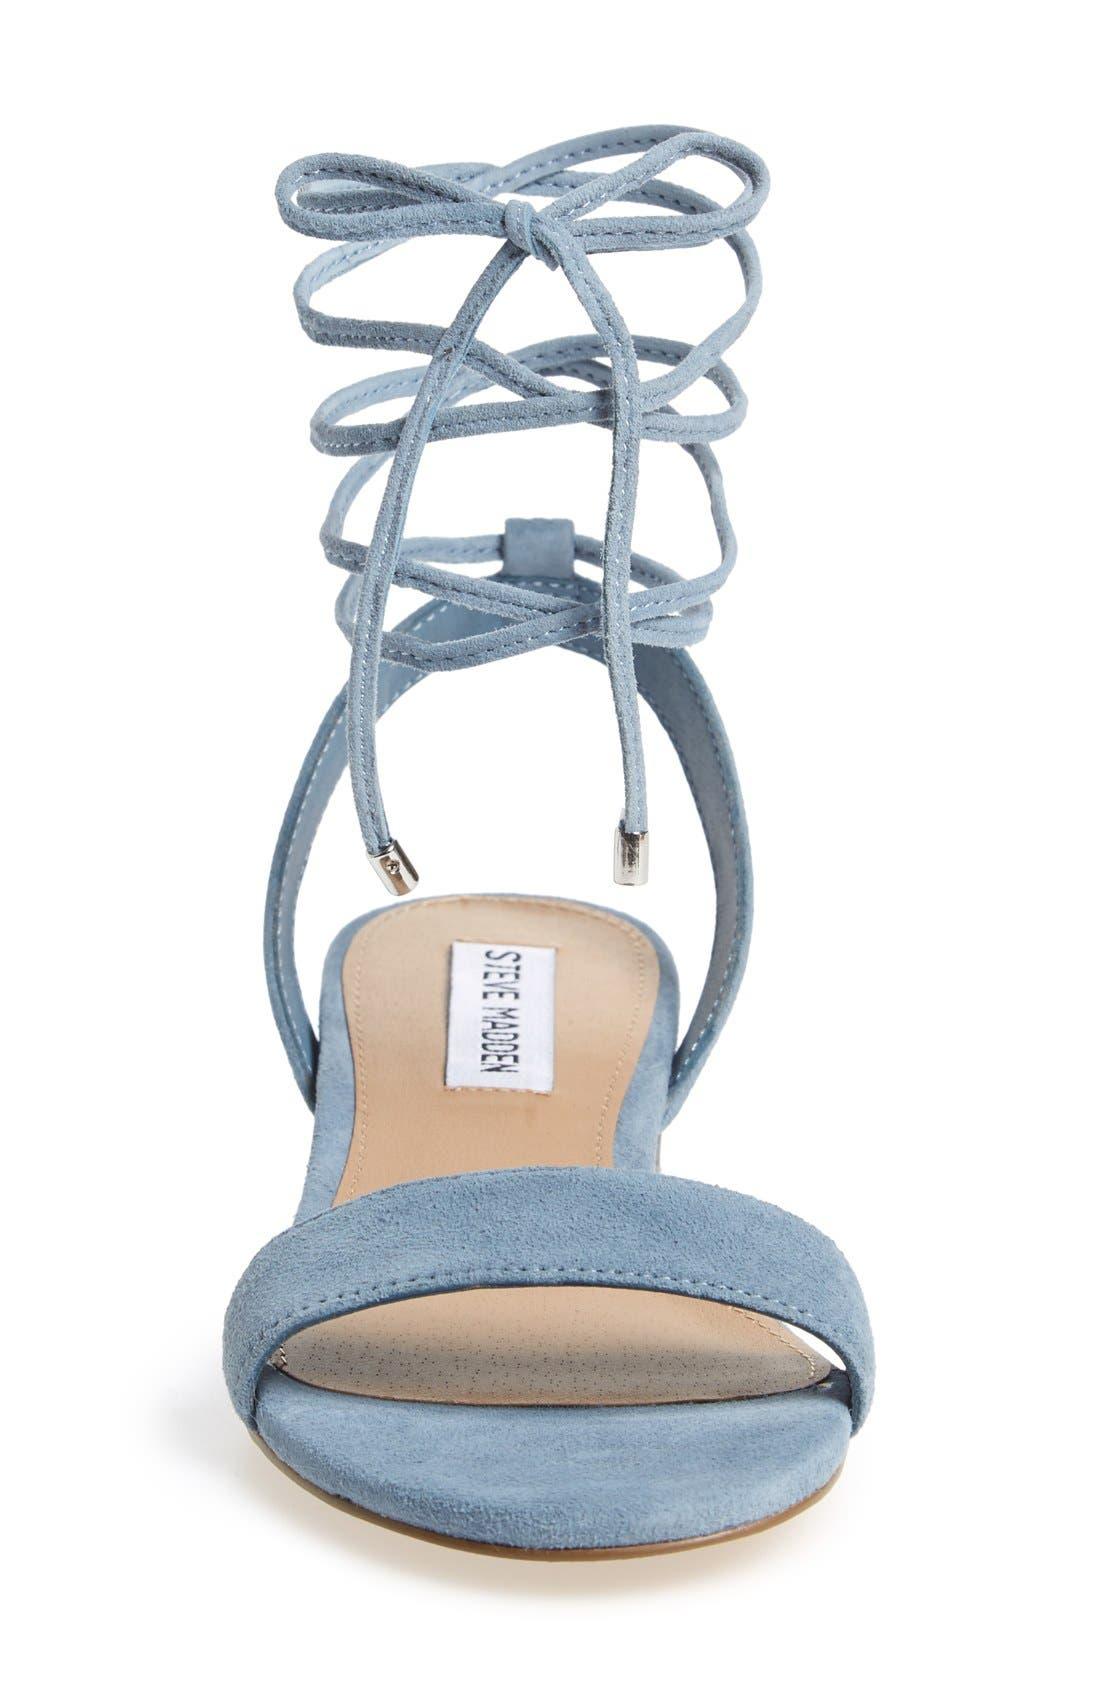 'Carolyn' Lace-Up Sandal,                             Alternate thumbnail 3, color,                             Blue Suede